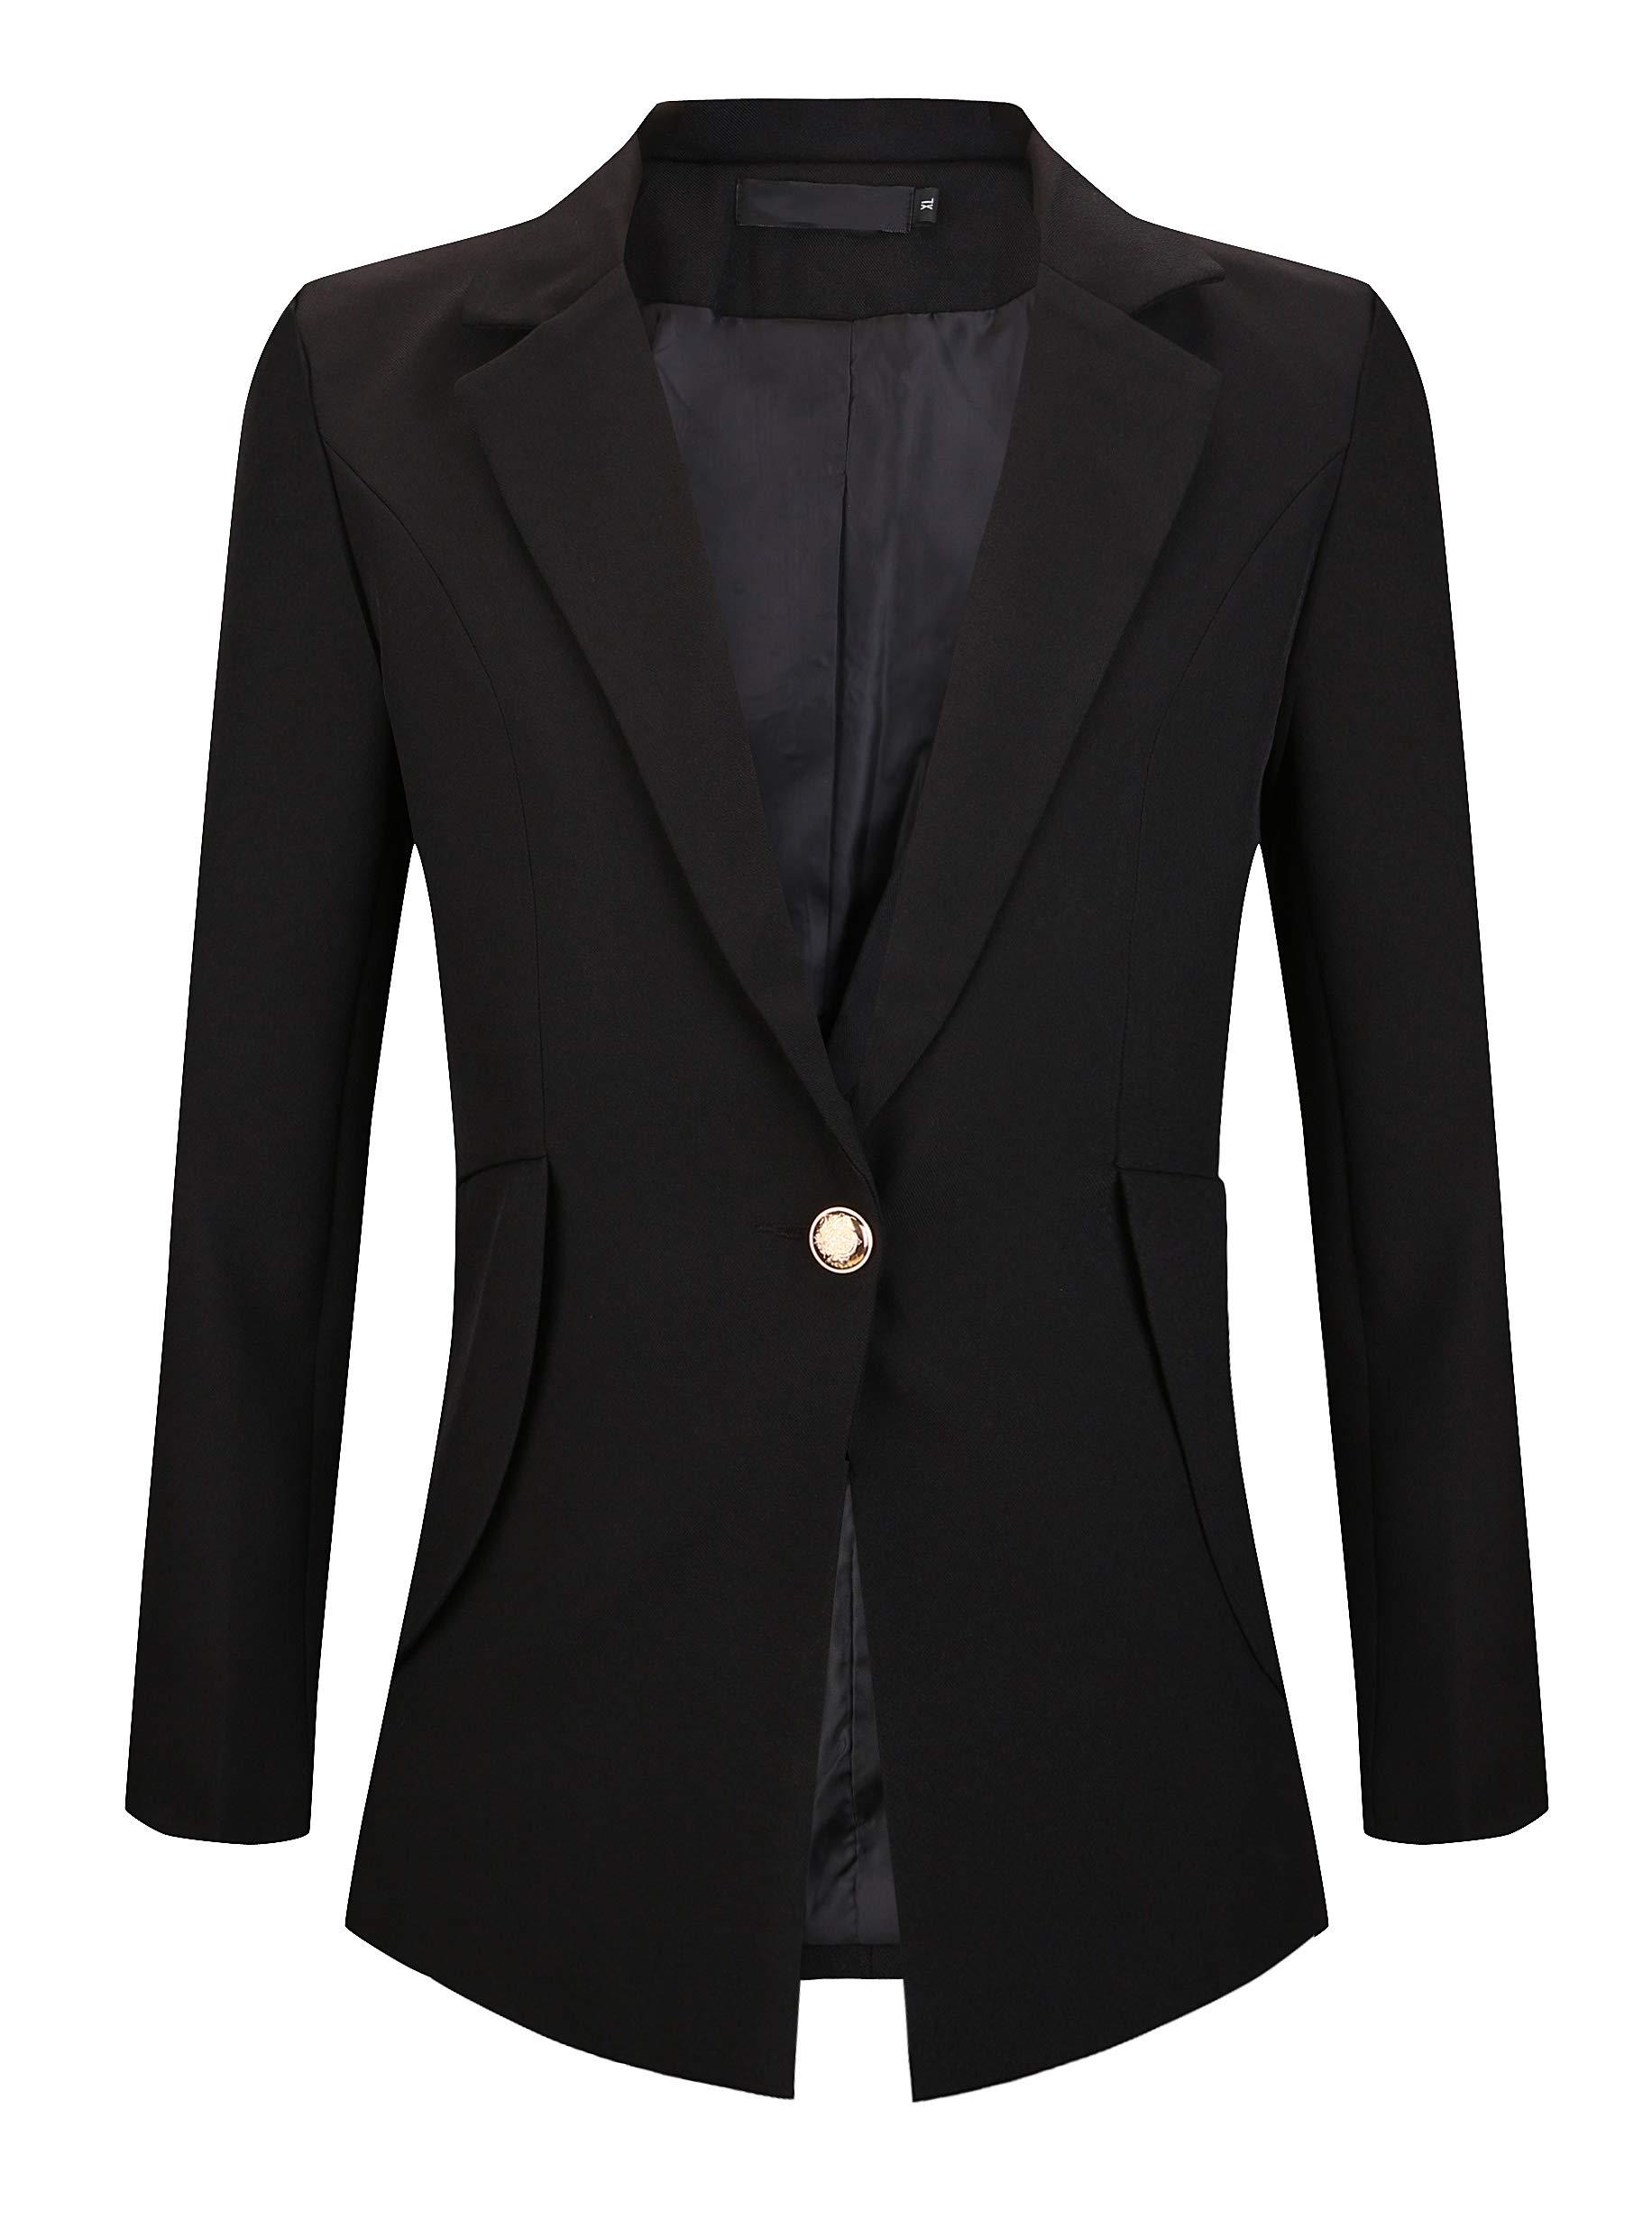 My Wonderful World Women's Slim Fit Notch Collar One Button Jacket Office Blazers Black US 16 (tag Asian 6XL)